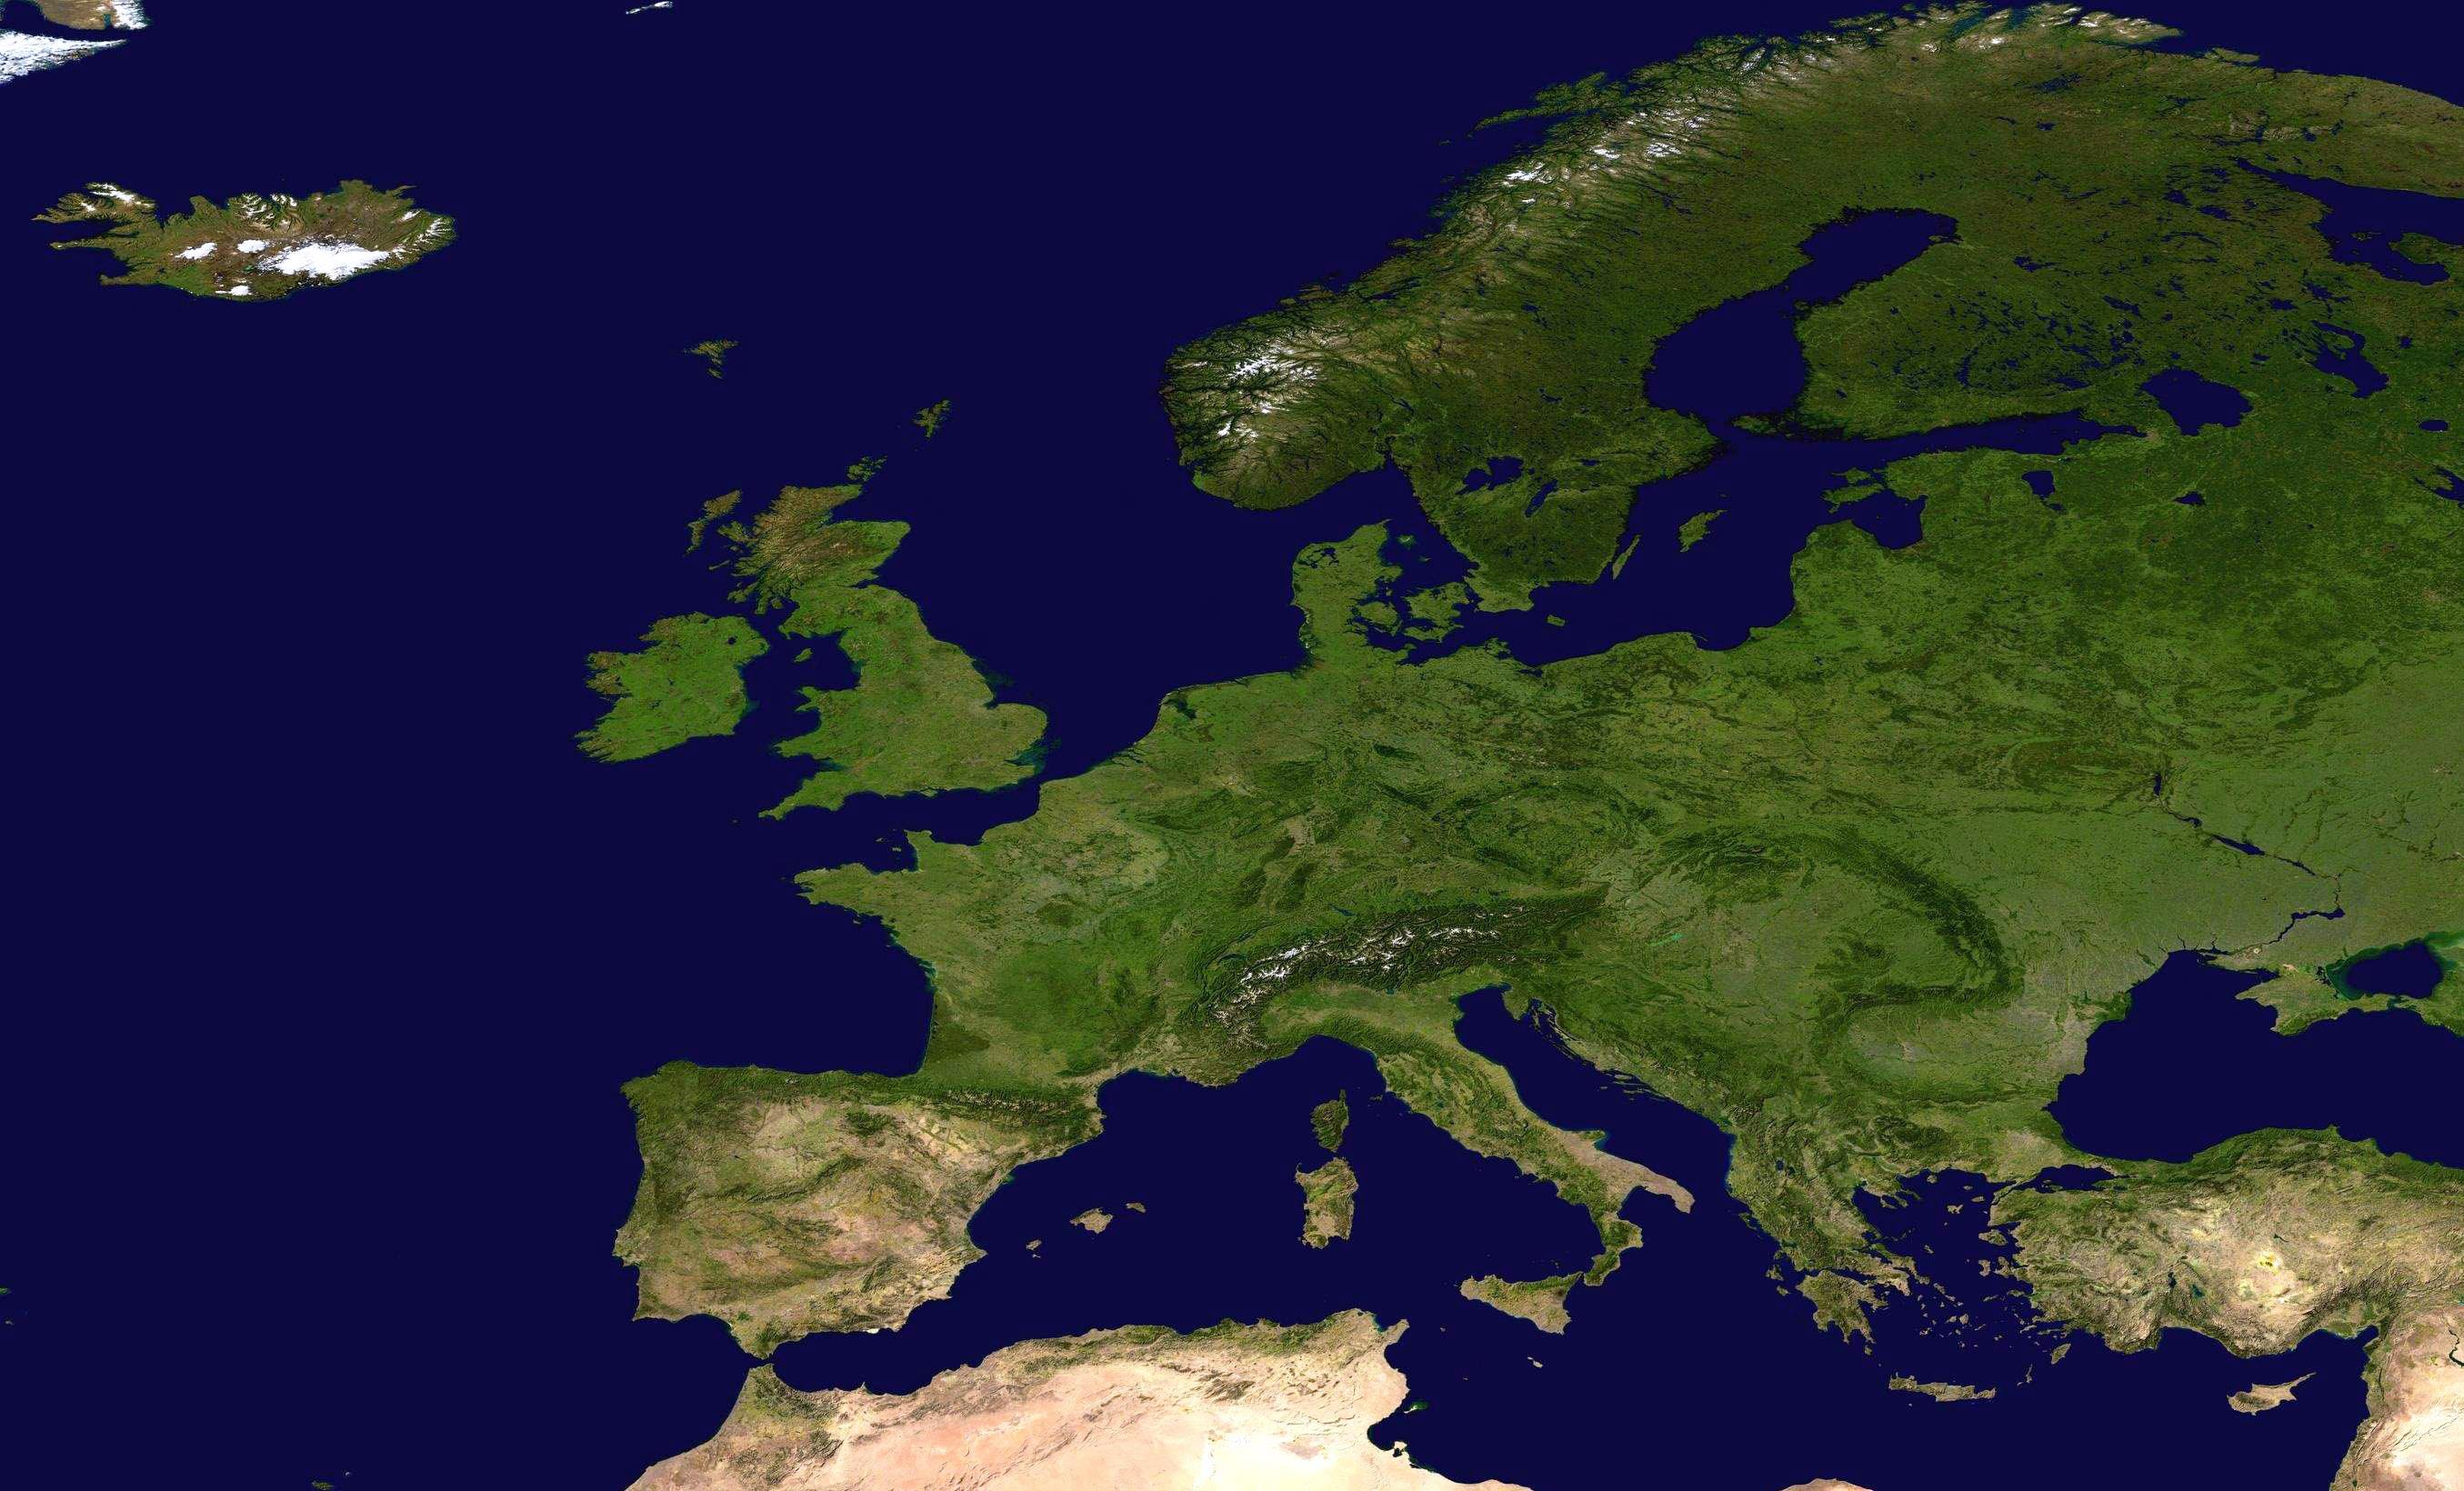 Large Detailed Satellite Map Of Europe Europe Mapsland Maps - World satellite map application